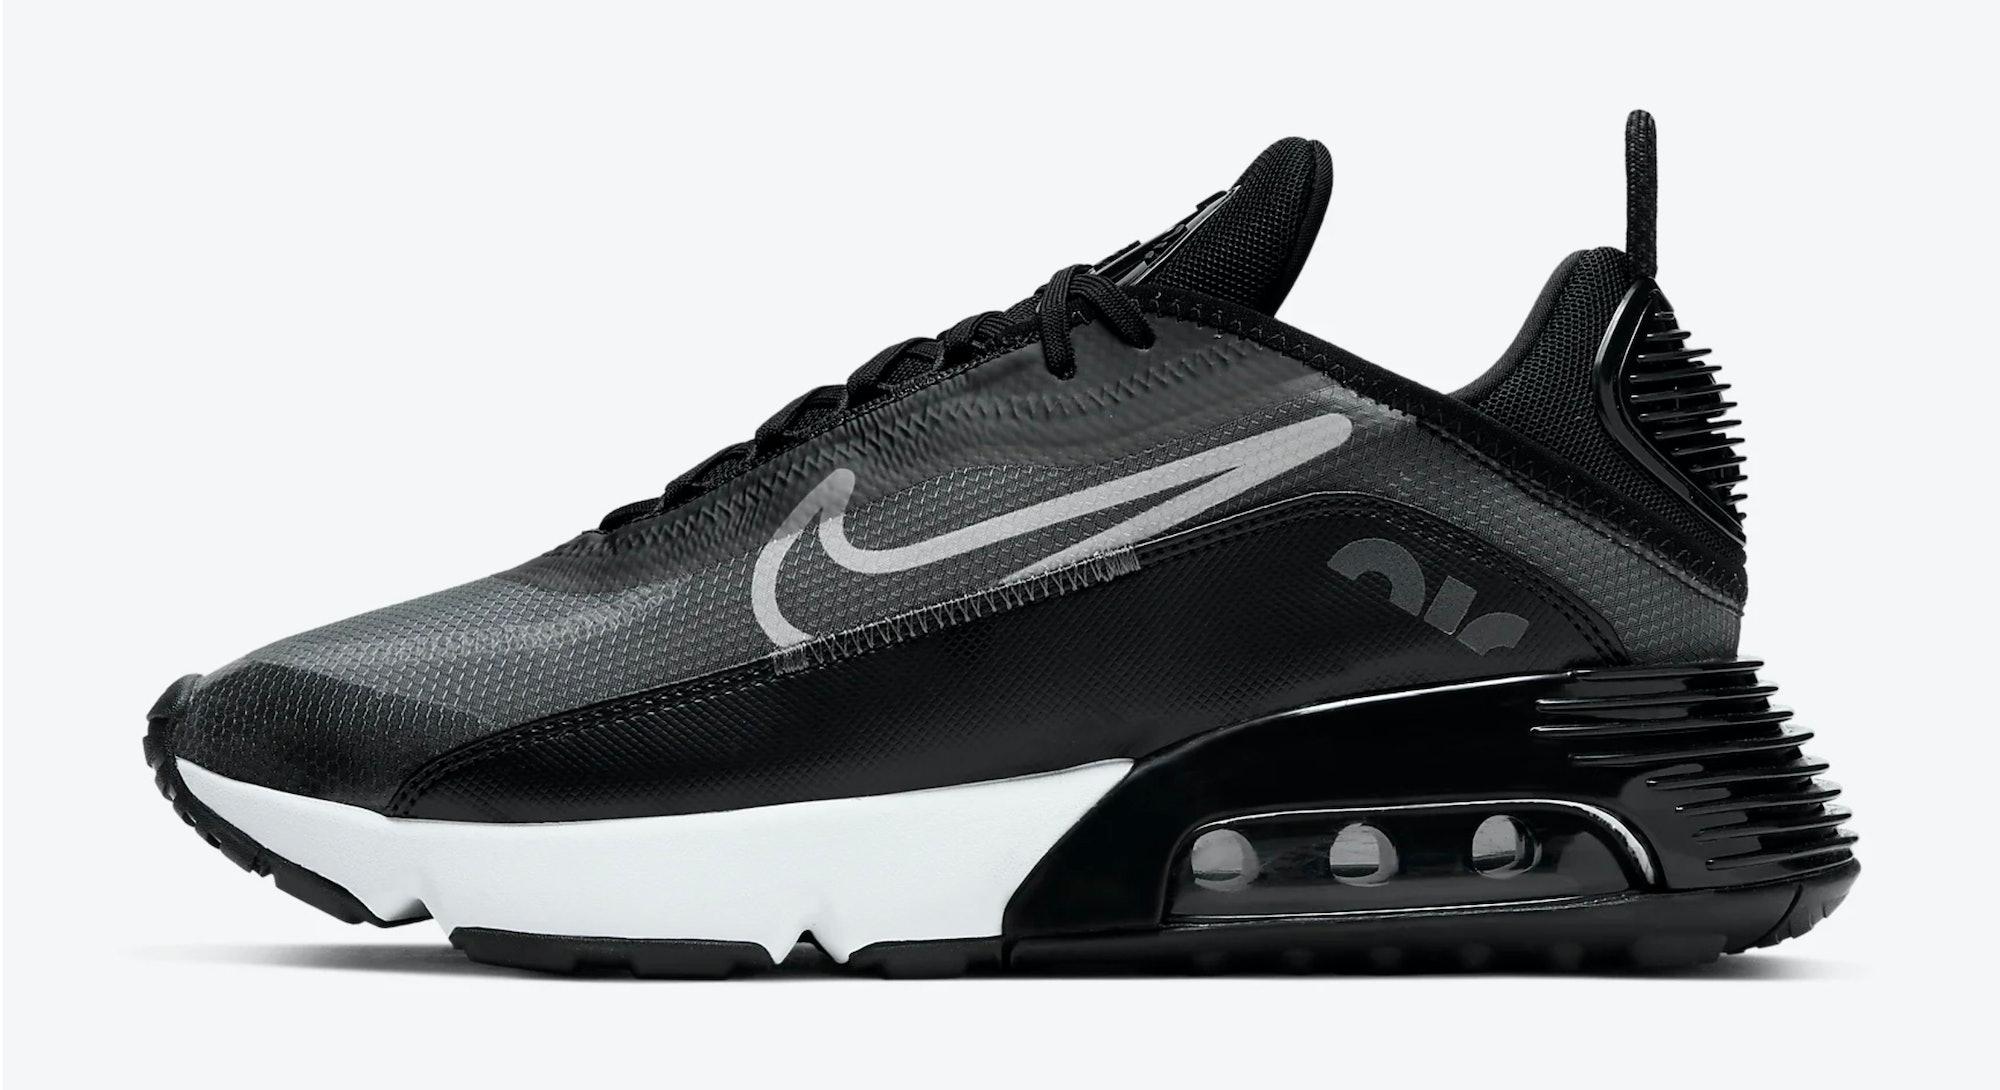 Nike Airmax 2090